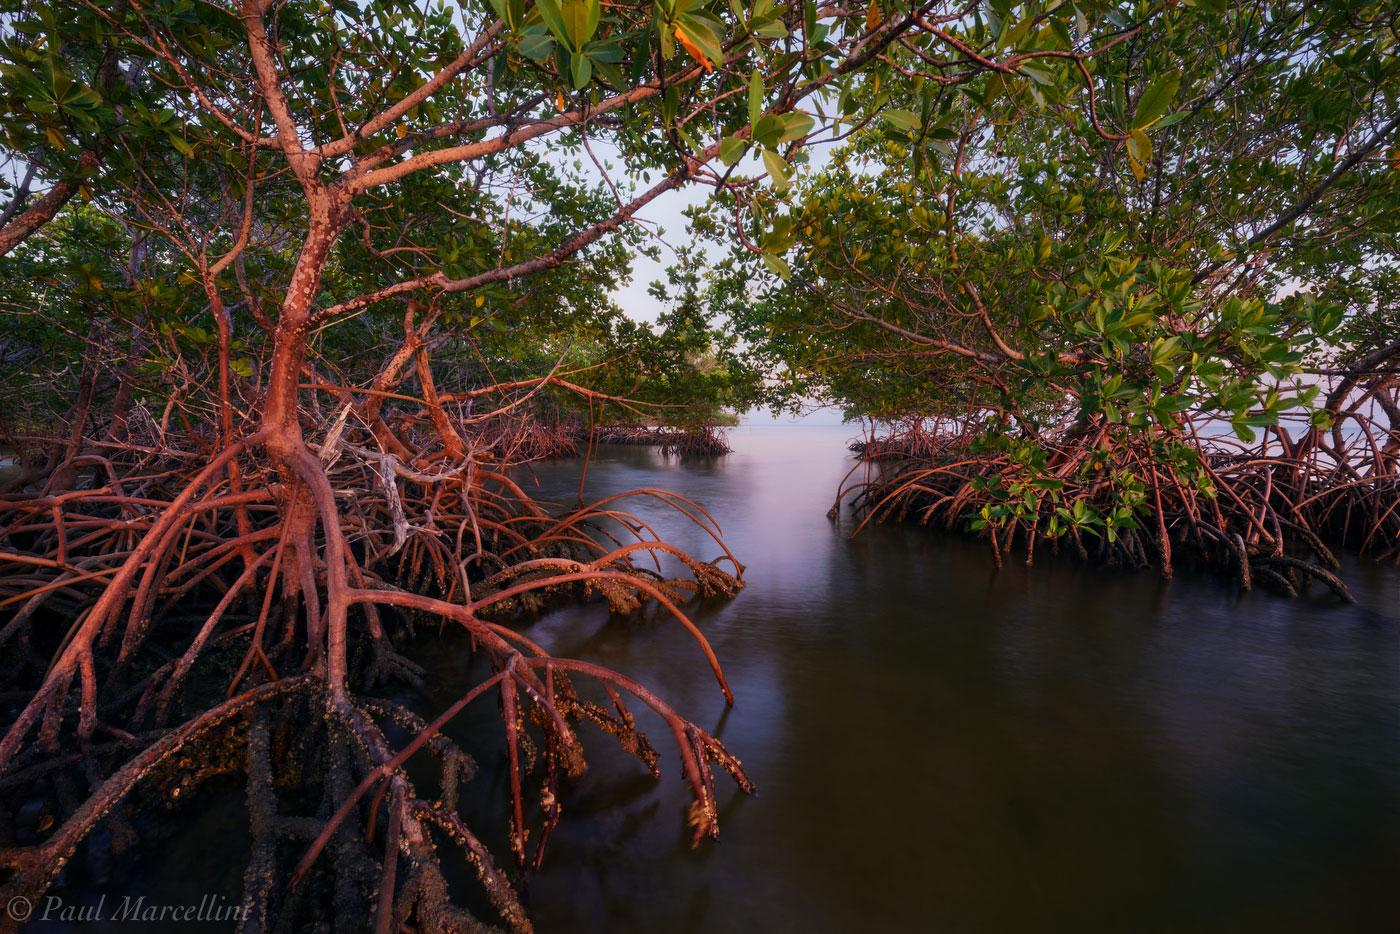 Ten Thousand Islands, Everglades National Park, Floridam mangroves, florida, nature, photography, florida national parks, photo